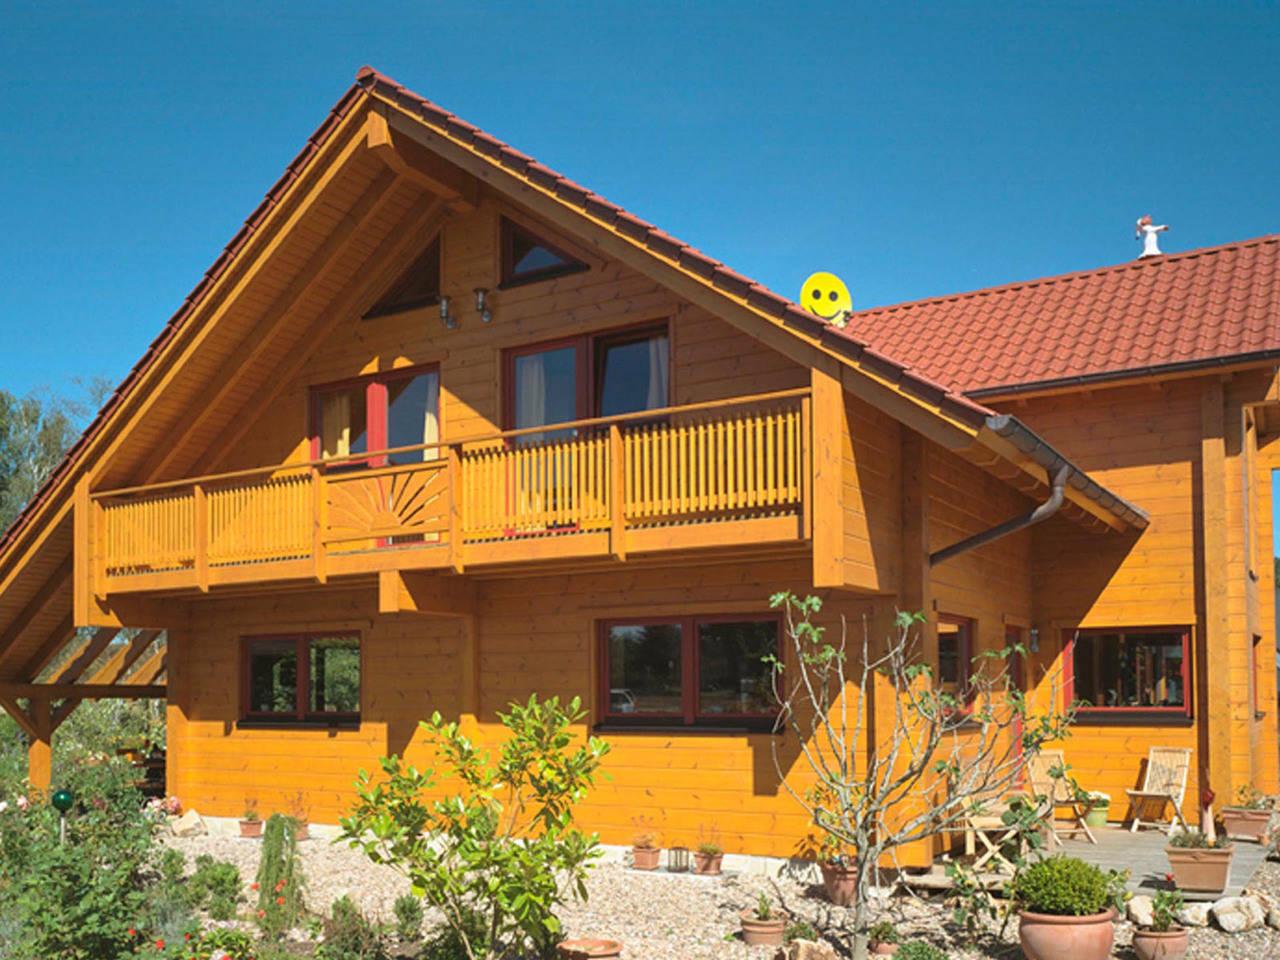 Holzhaus Familienglück von Fullwood Wohnblockhaus